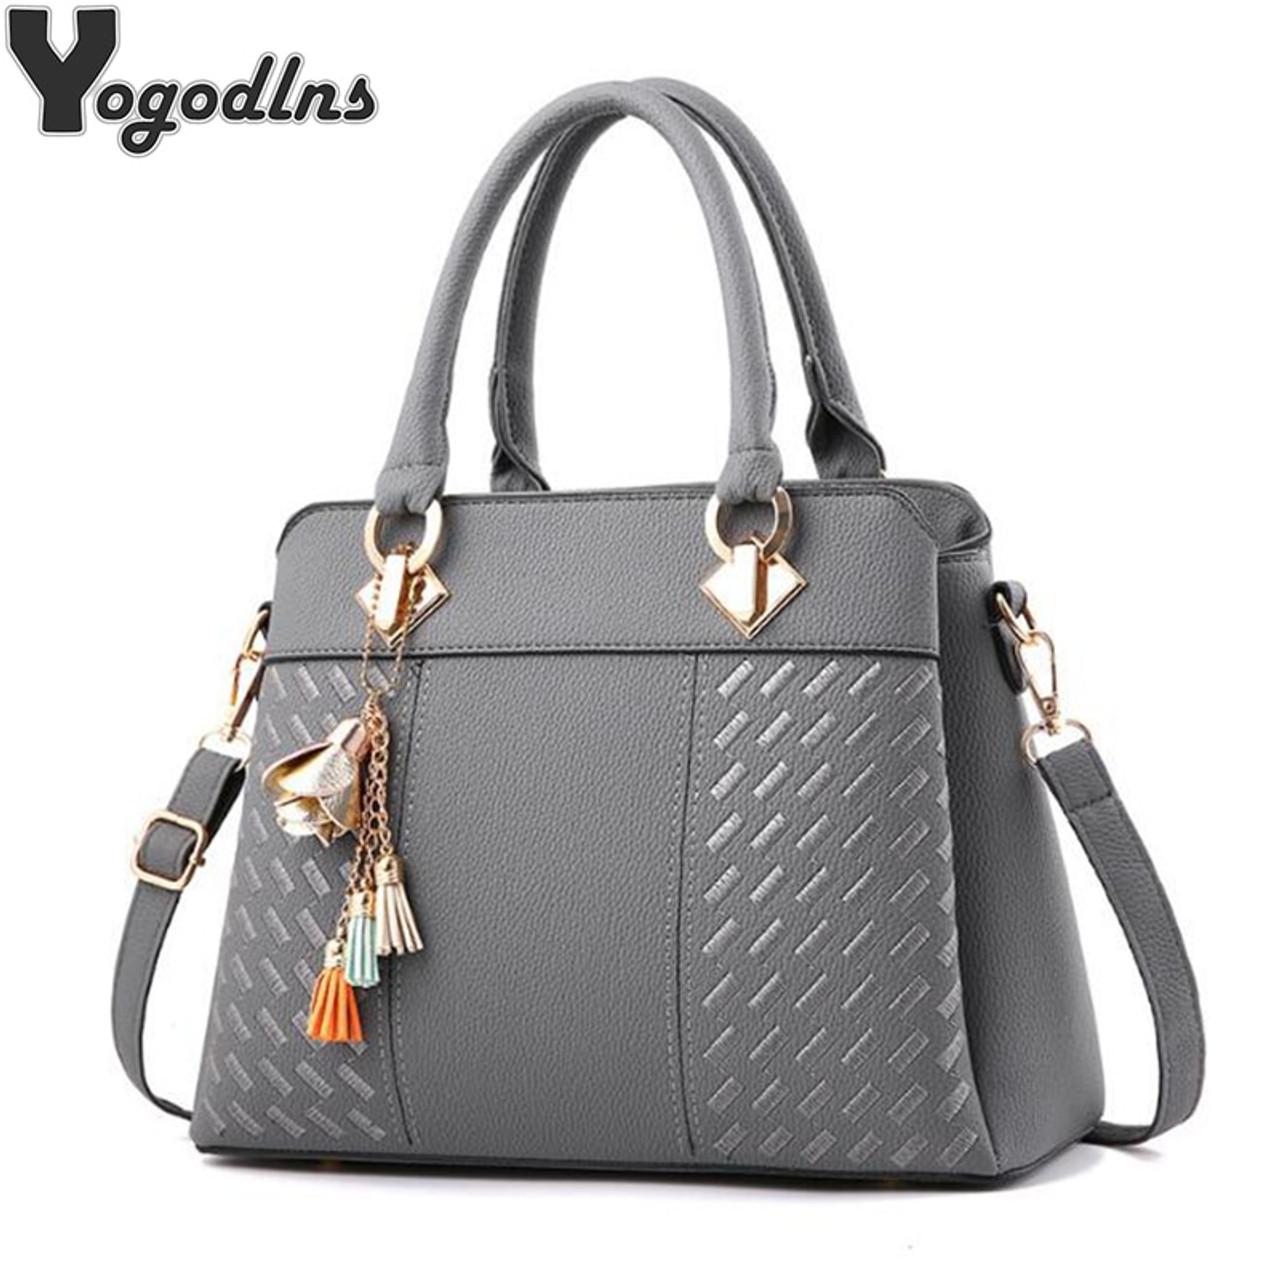 8207cbcdfb8b Fashion Women Handbags Tassel PU Leather Totes Bag Top-handle Embroidery  Crossbody Bag Shoulder Bag Lady Simple Style Hand Bags